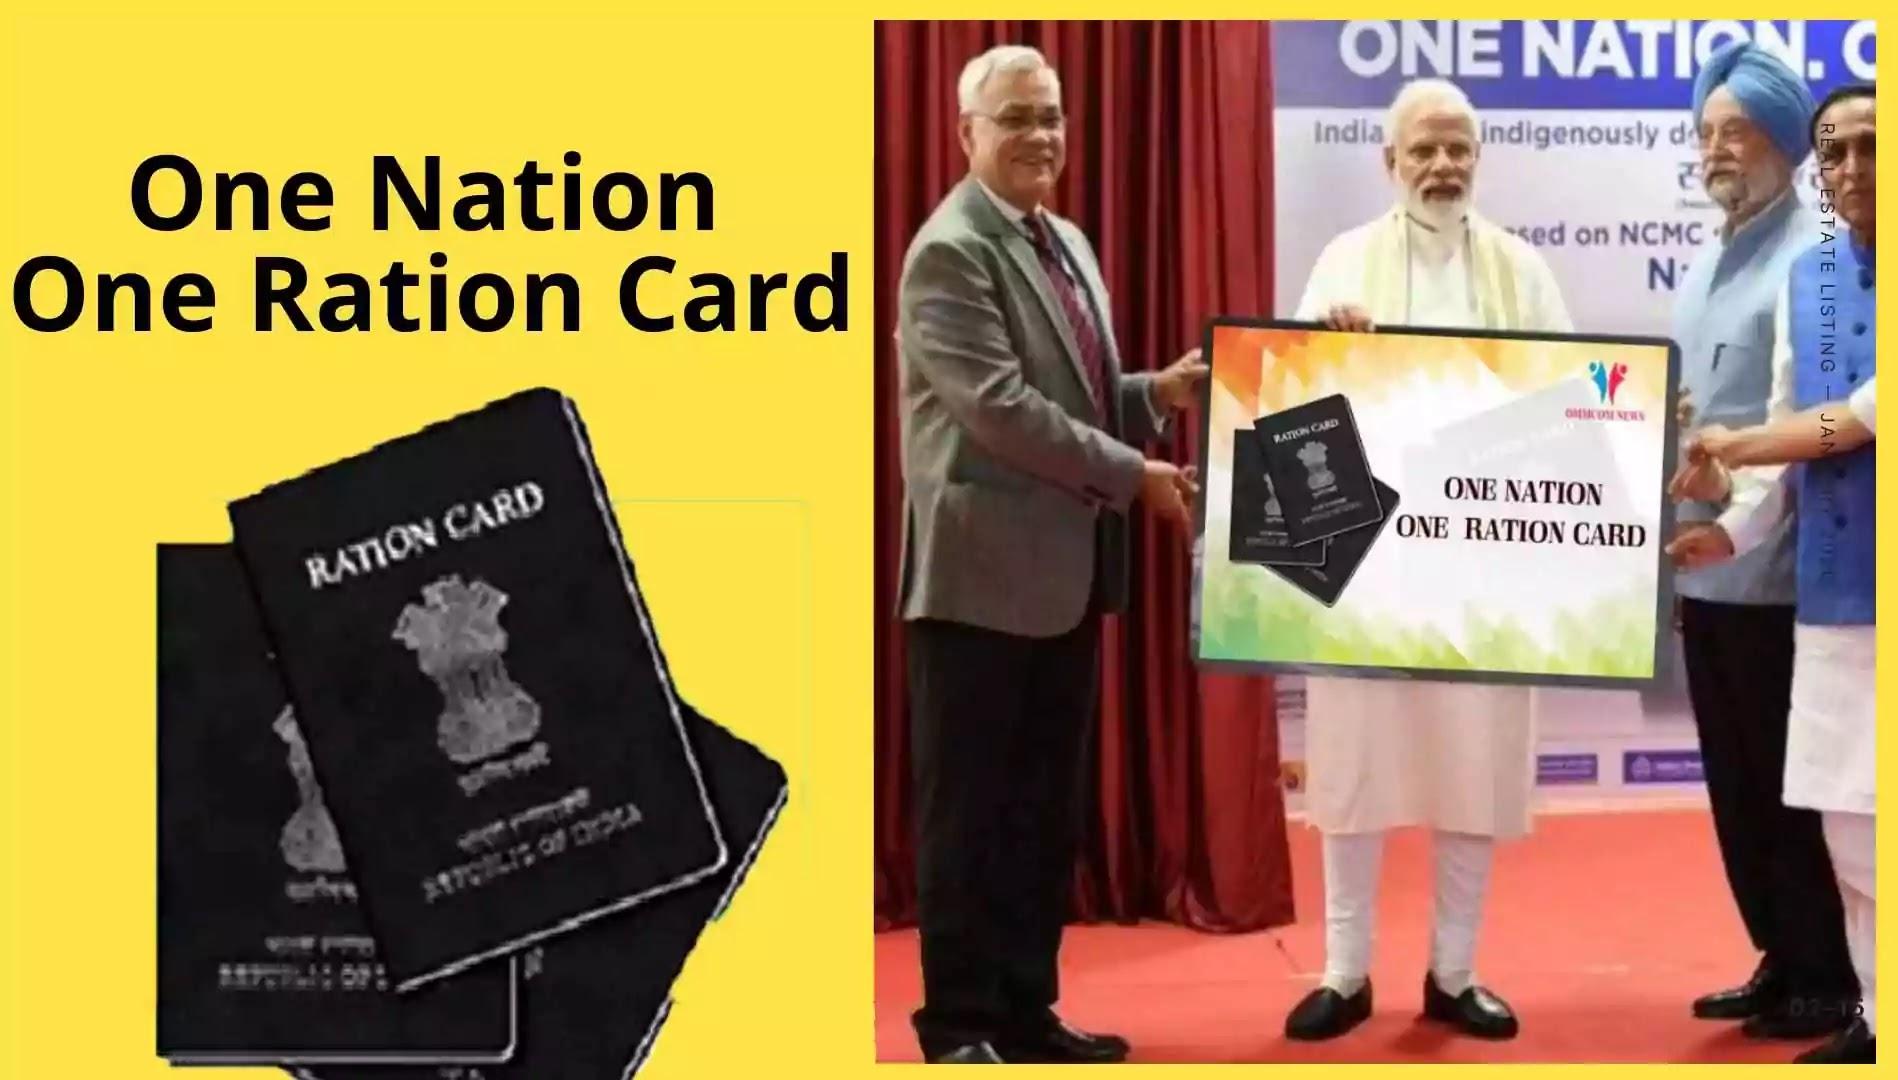 एक देश एक राशन कार्ड योजना, One Nation One Ration Card Scheme, One Nation One Ration Card PIB, One Nation One Ration Card UPSC